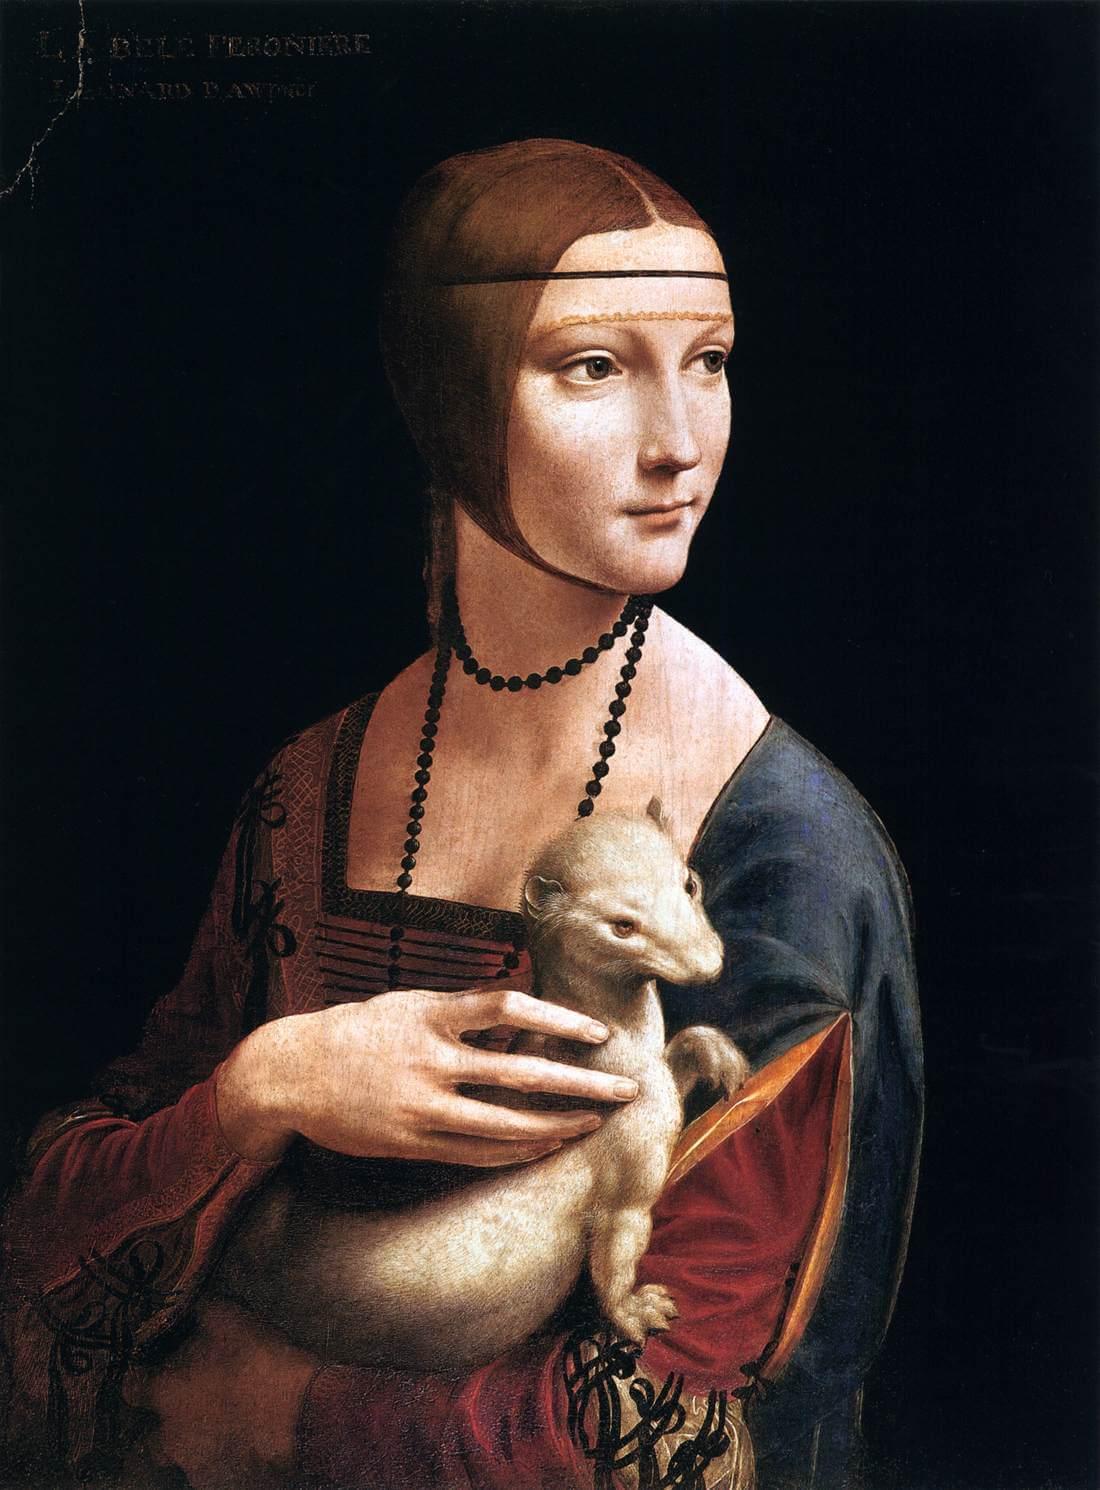 Leonardo da Vinci. Lady with an ermine